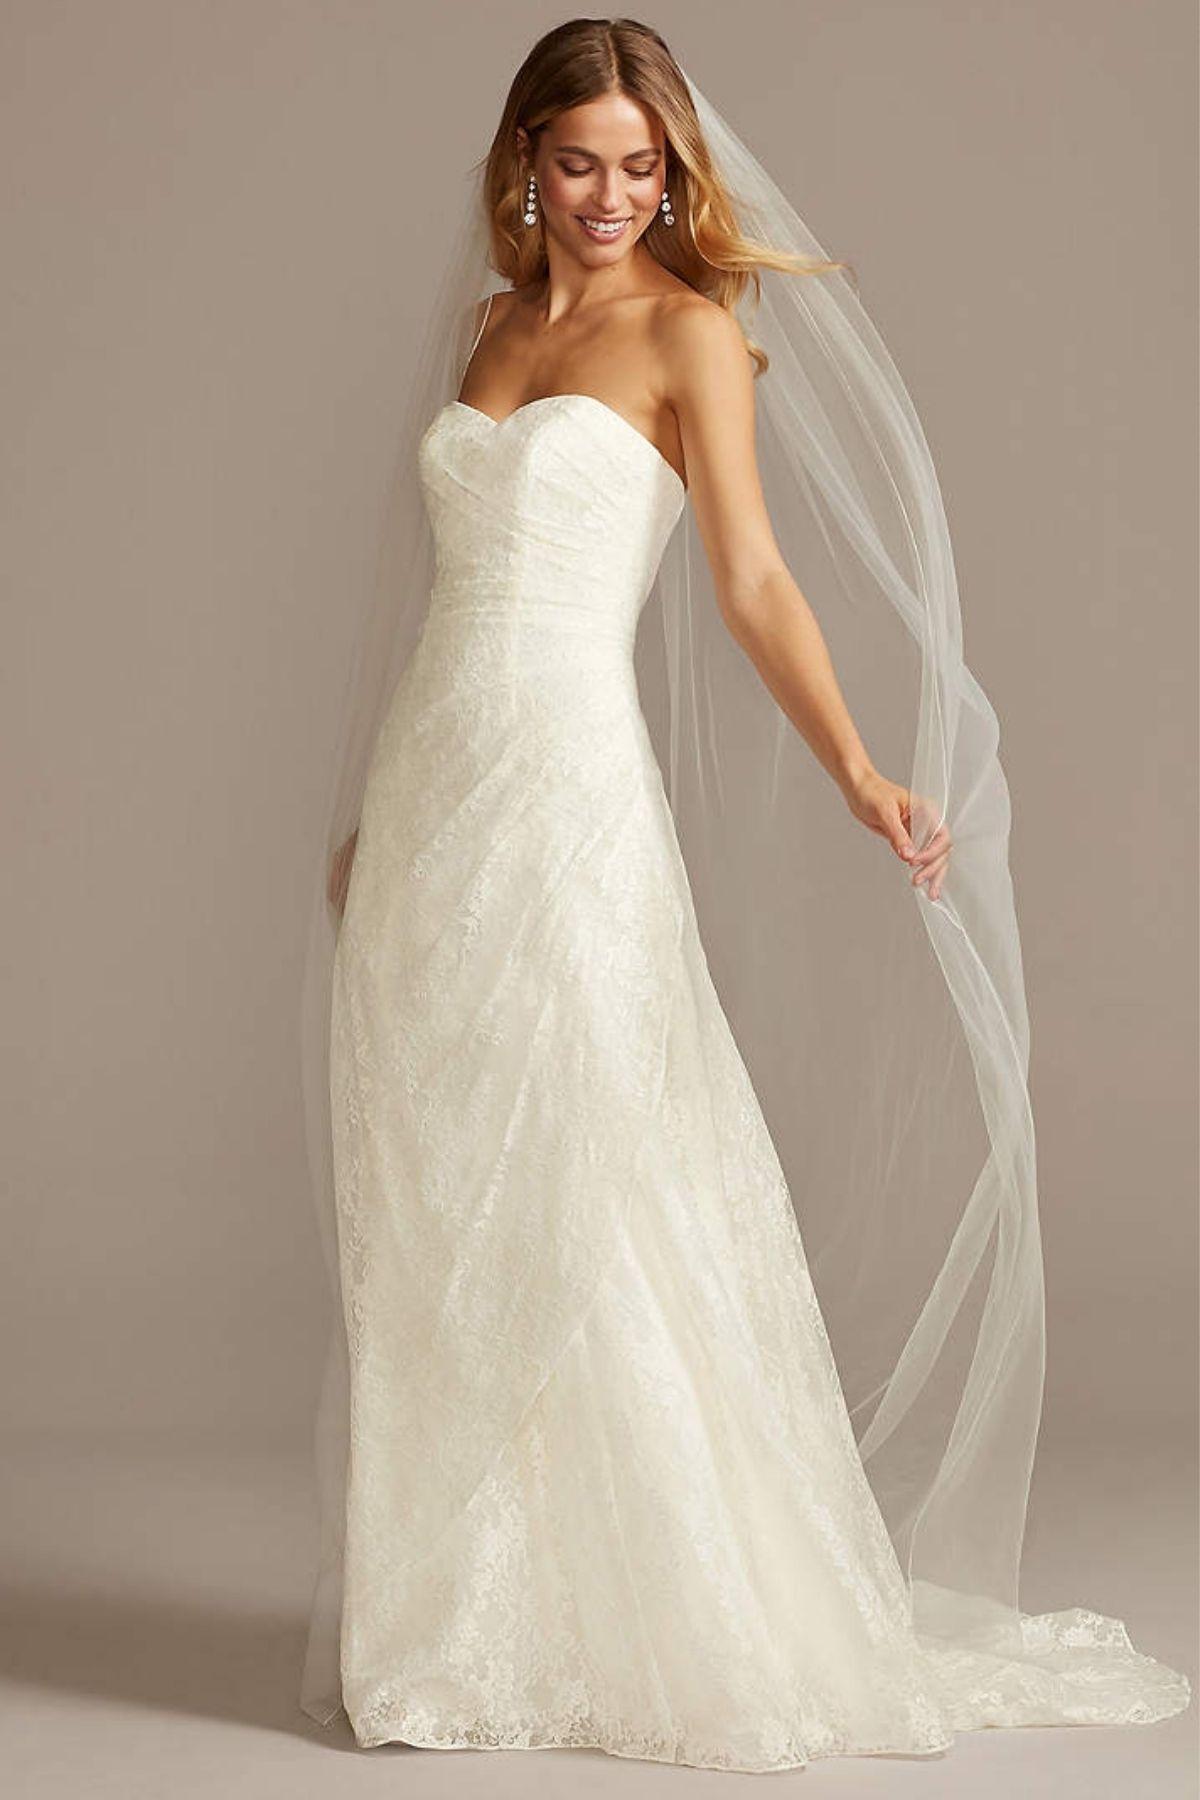 8. A-Line Strapless Sweetheart Neck Wedding Dress